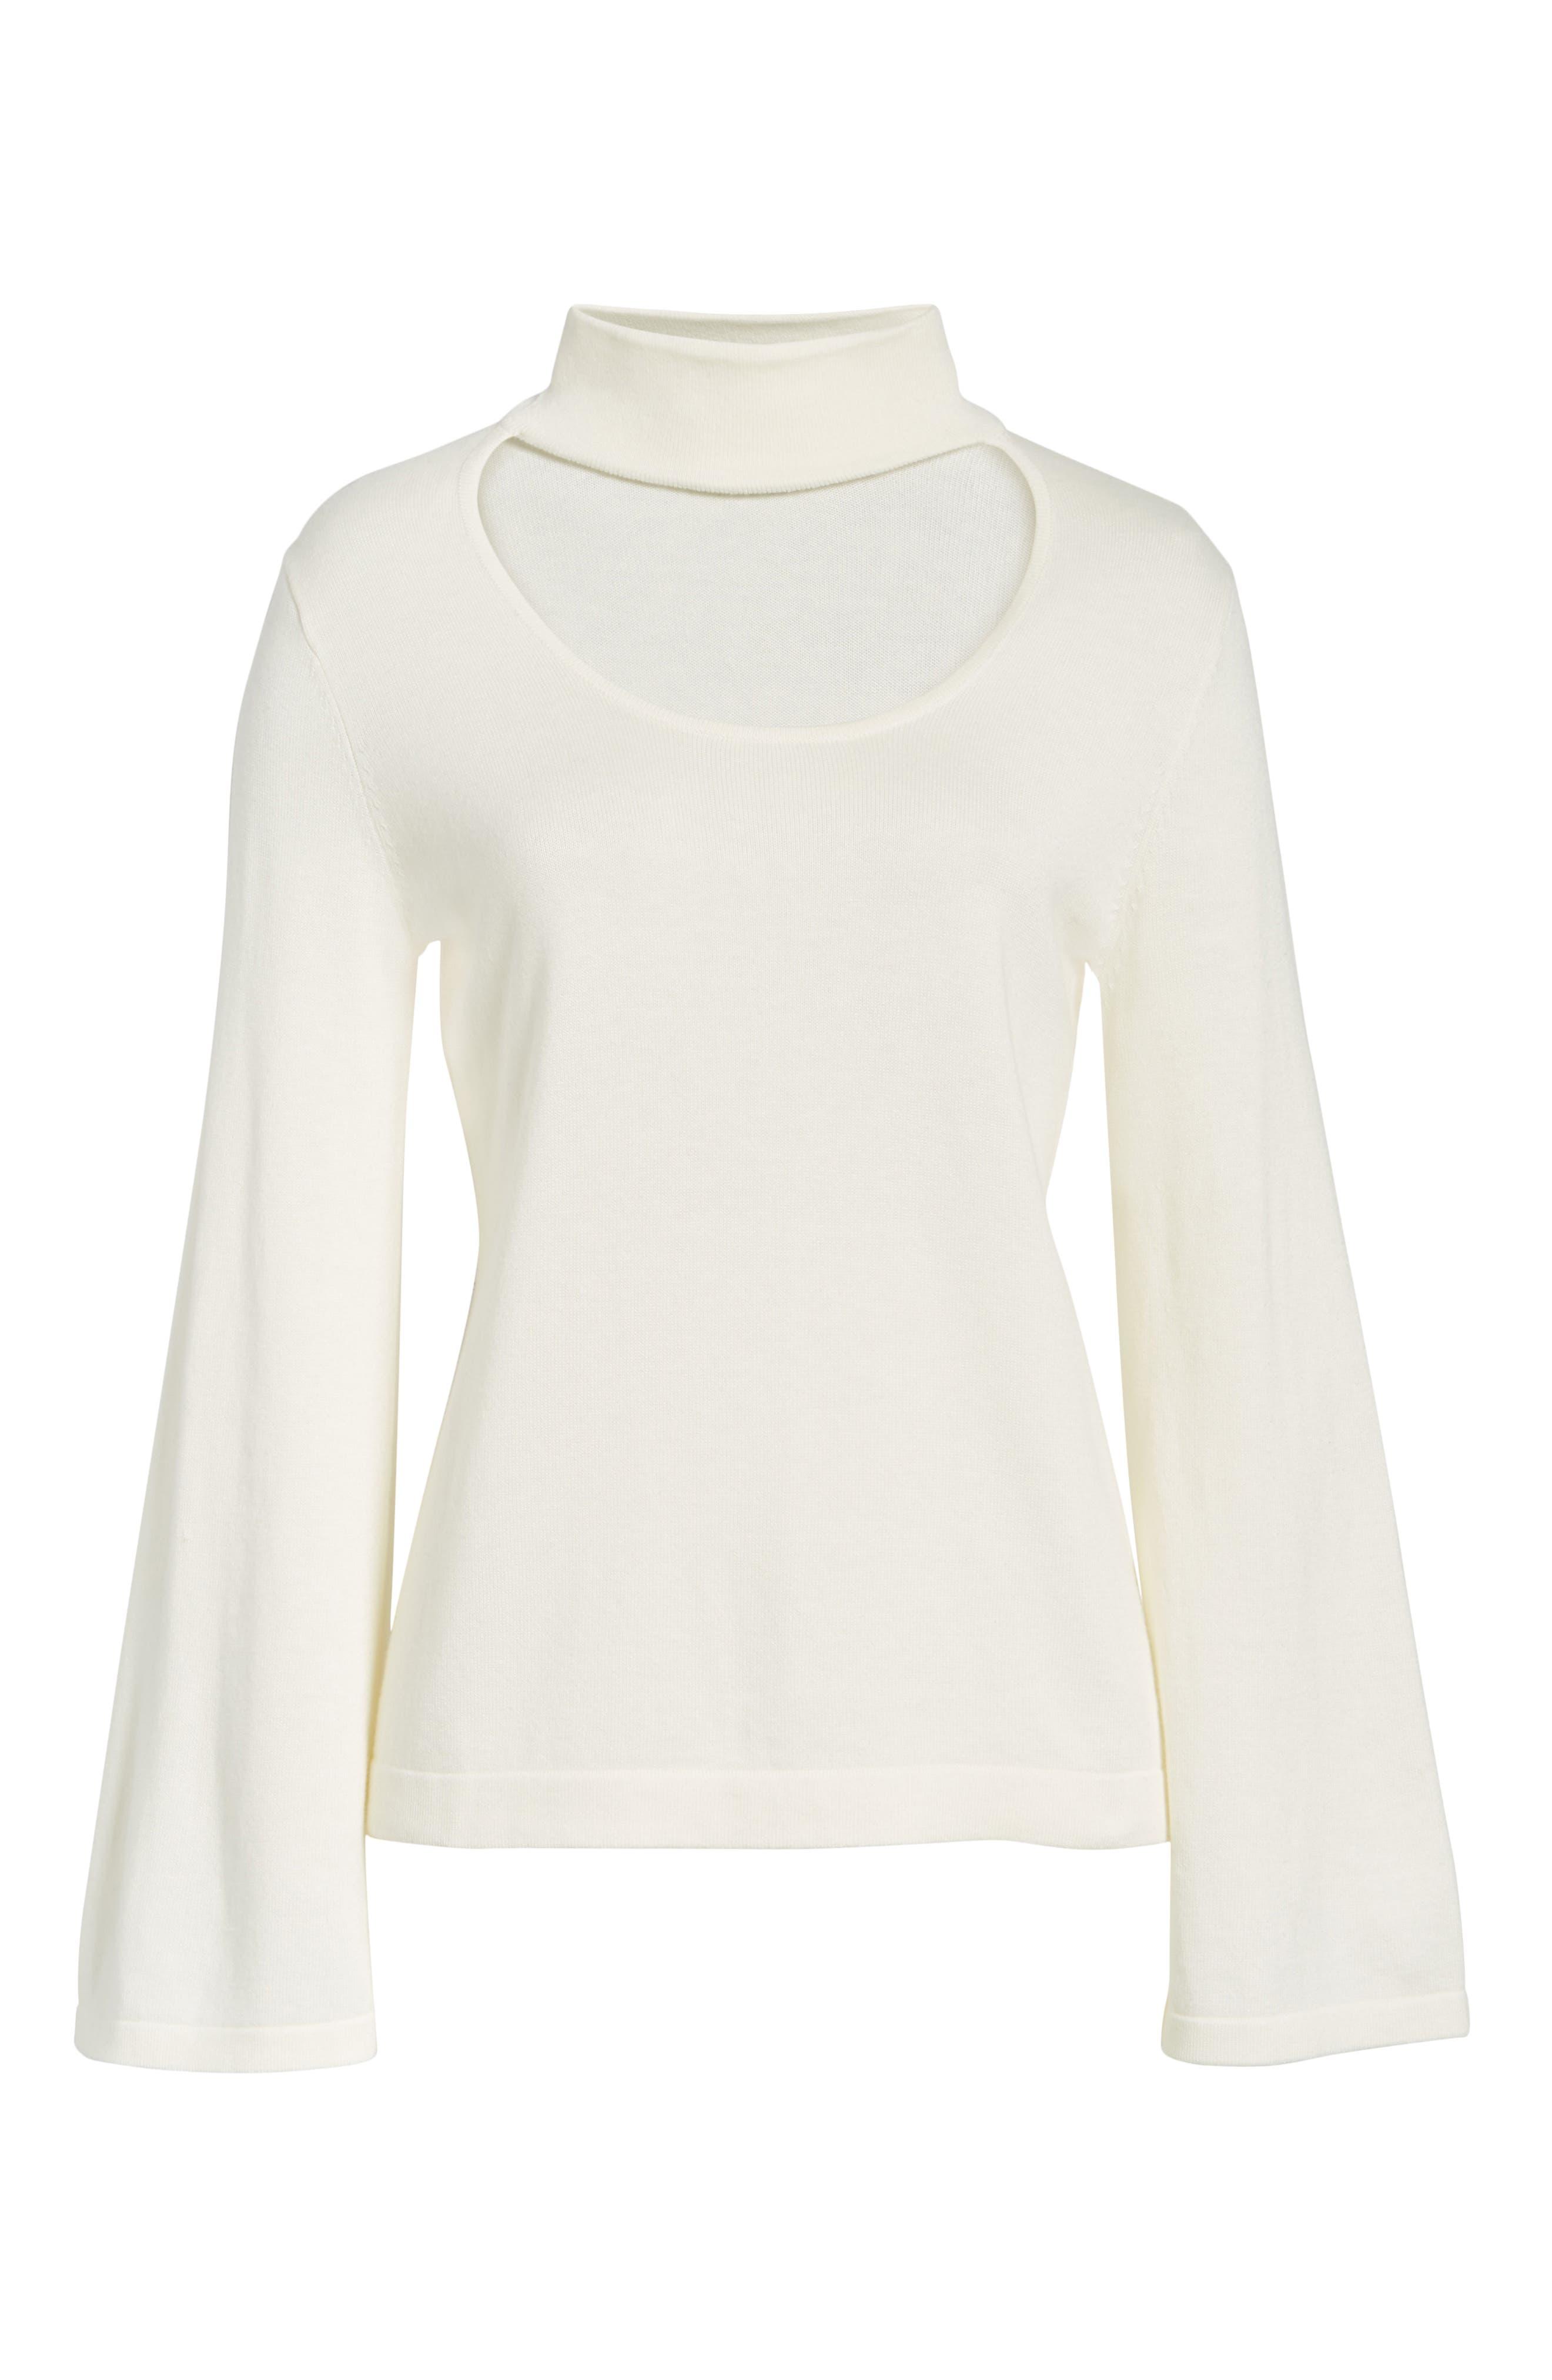 Bell Sleeve Choker Neck Sweater,                             Alternate thumbnail 5, color,                             Antique White